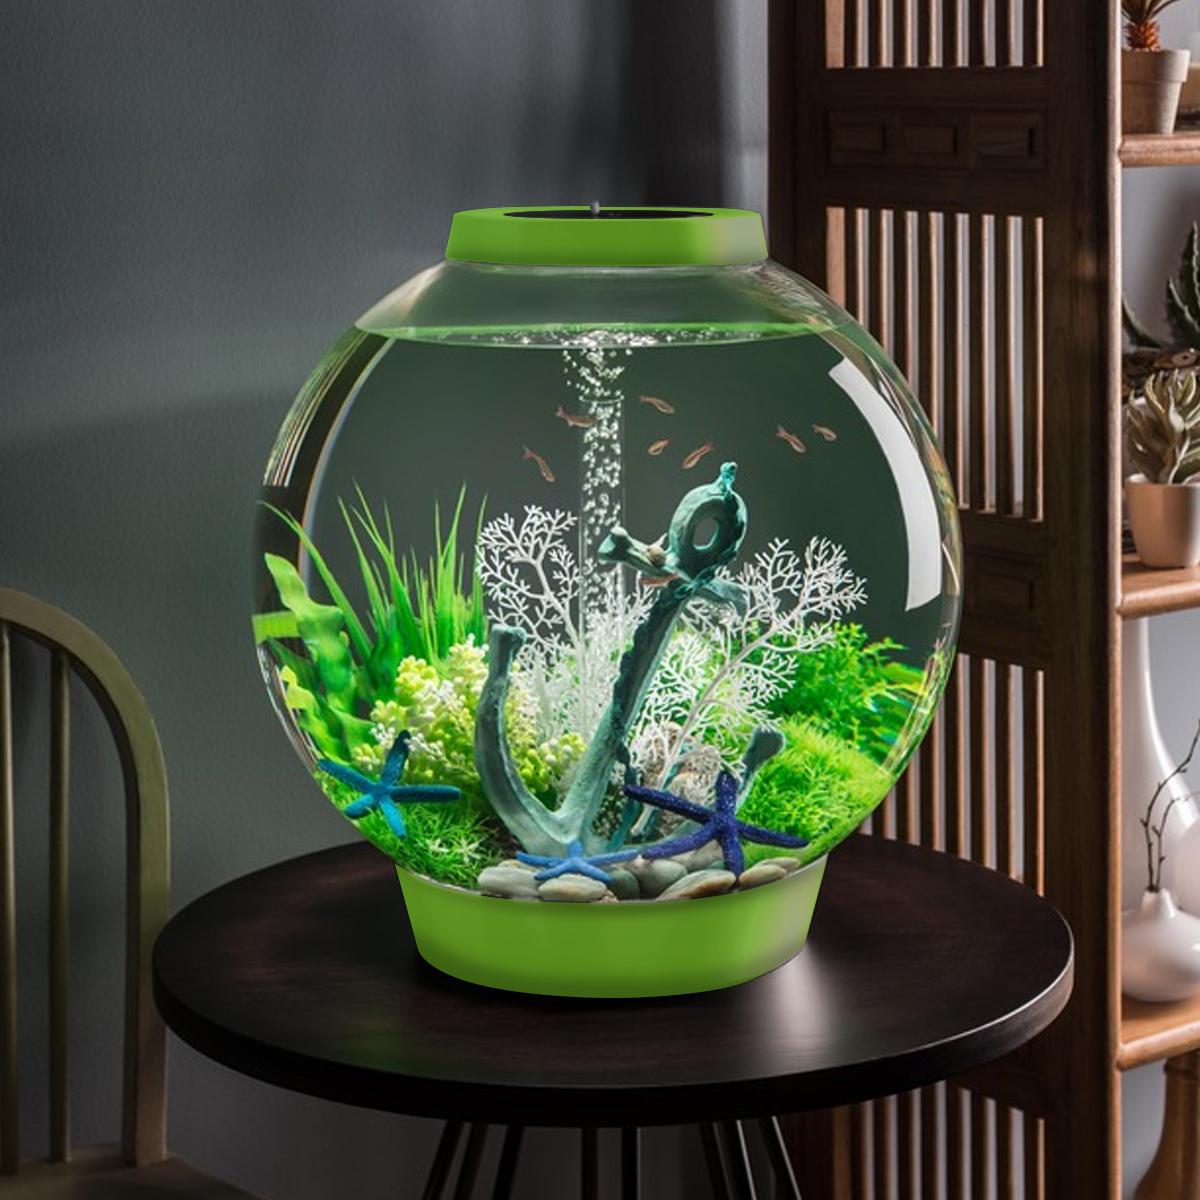 Biorb classic 60l leaf green aquarium led lighting acrylic for Acrylic fish tank